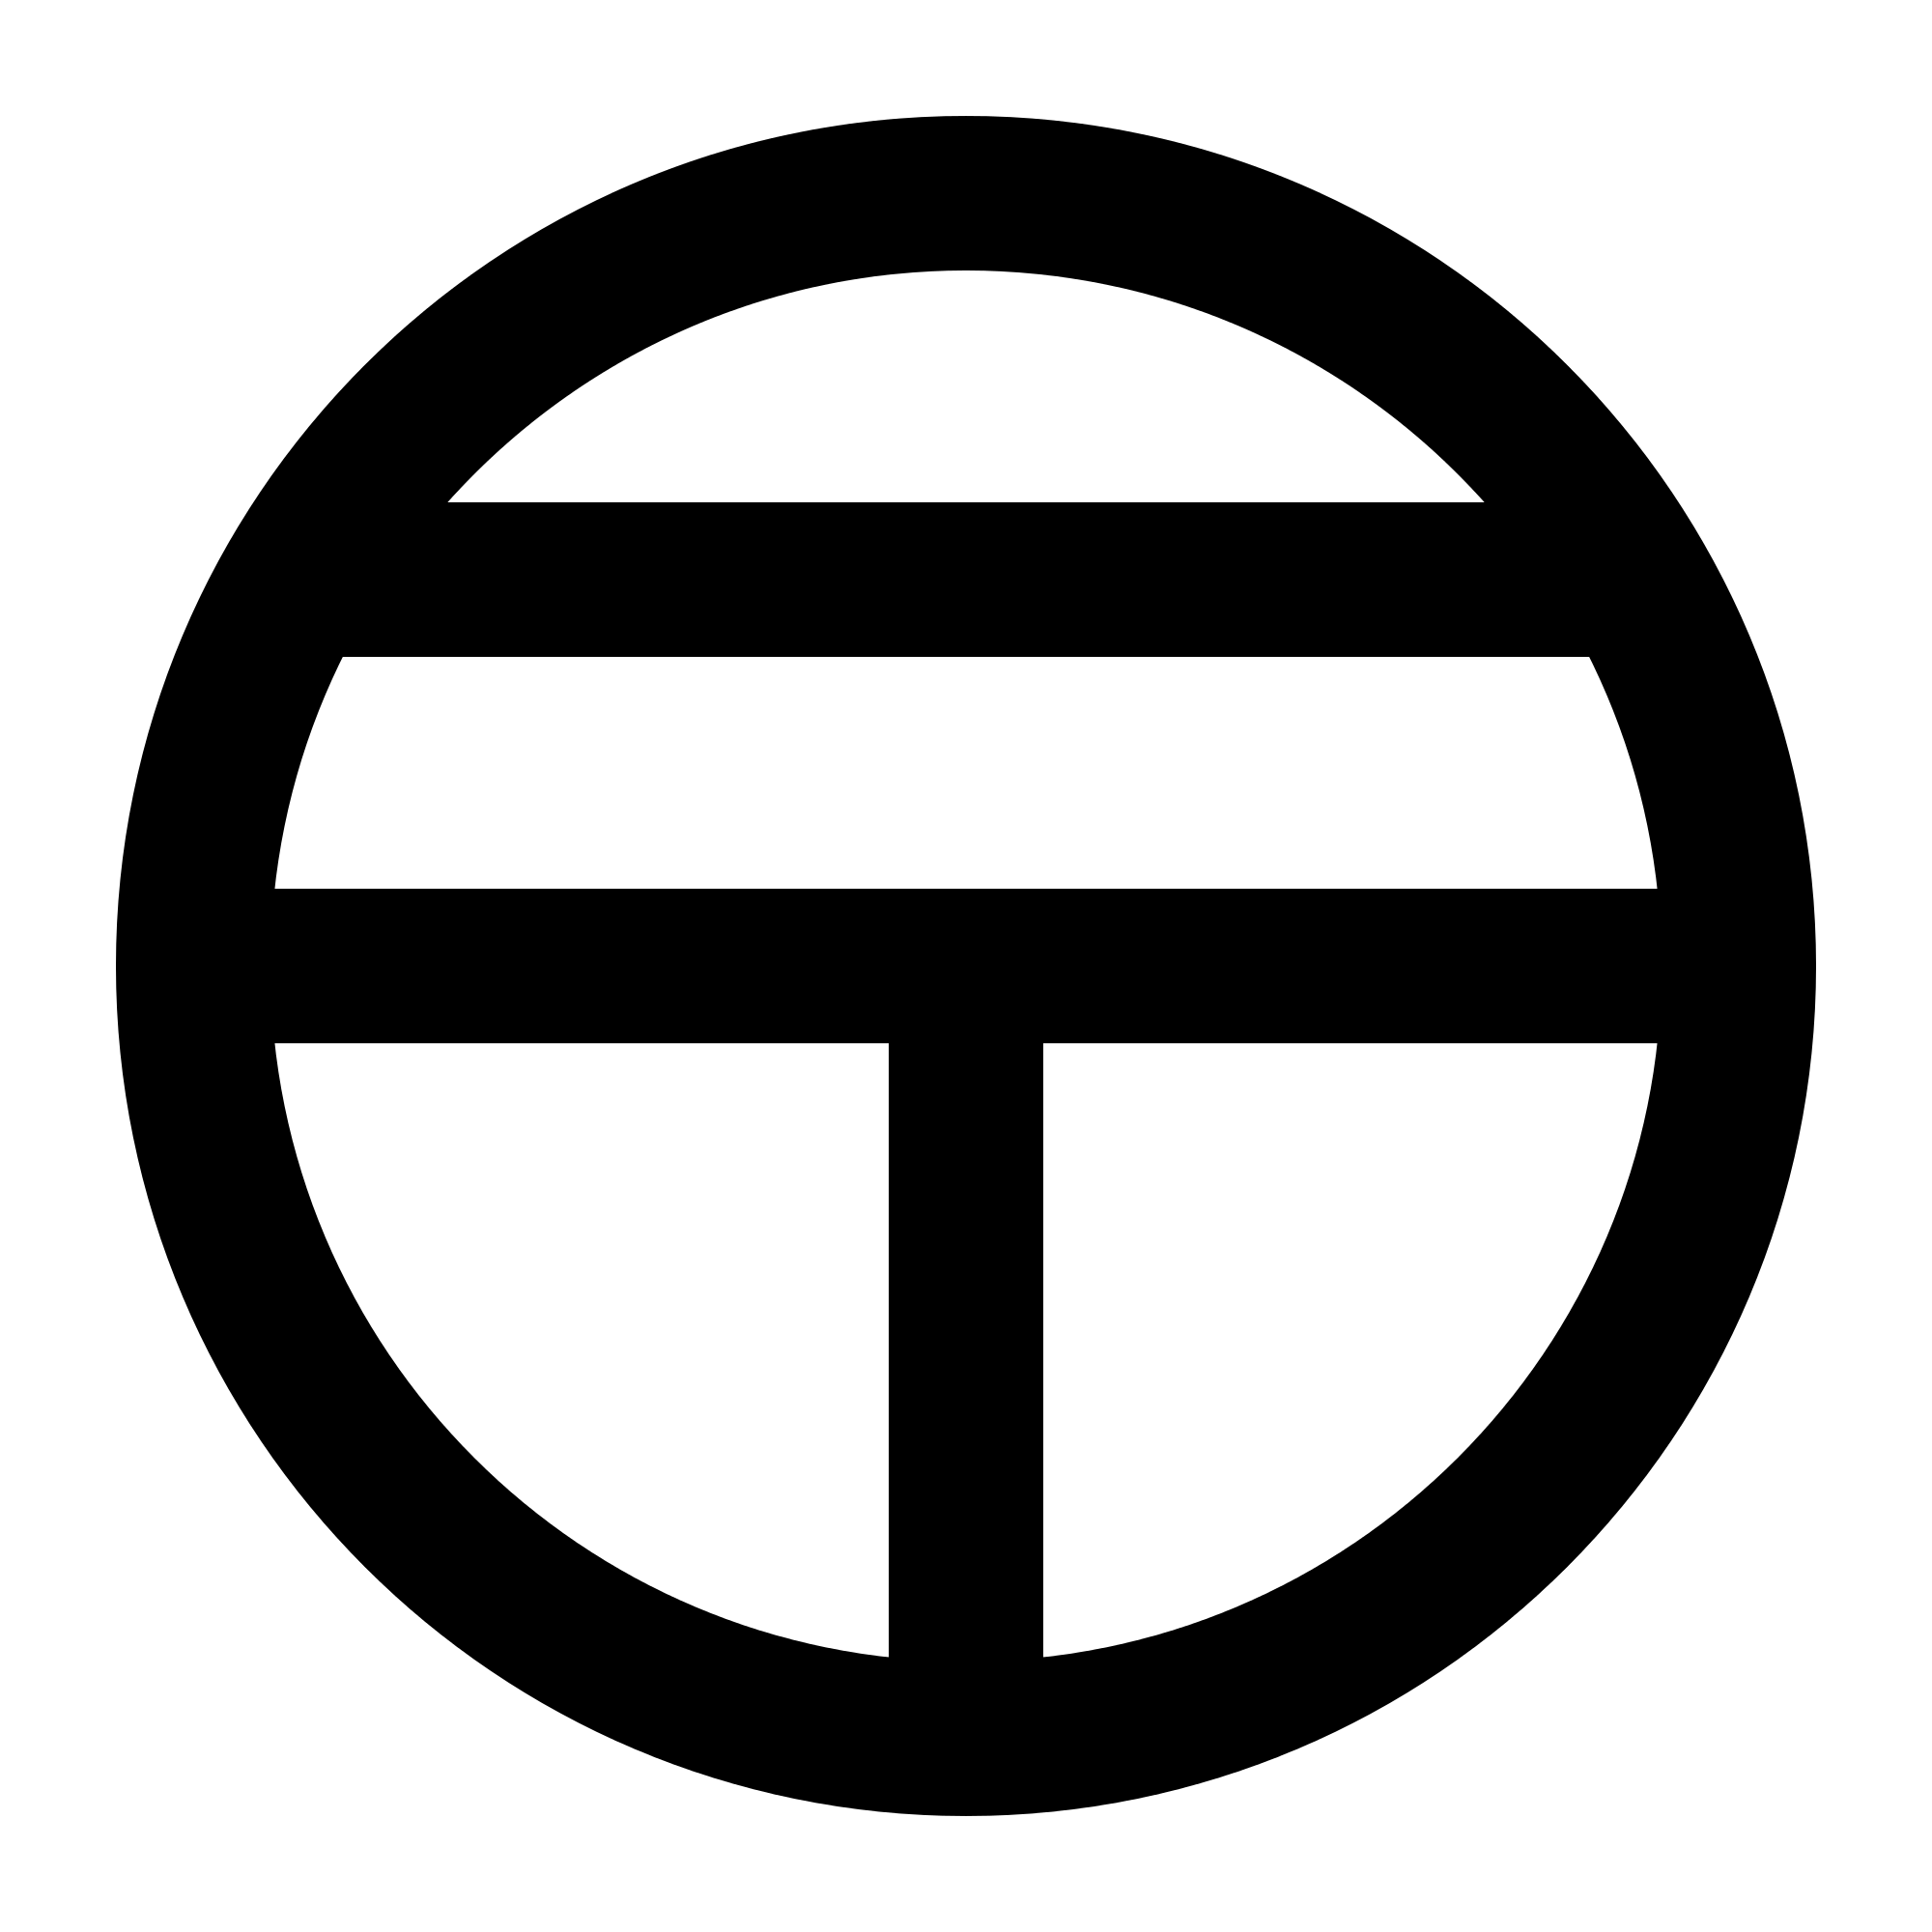 File japanese map symbol. Japan clipart svg